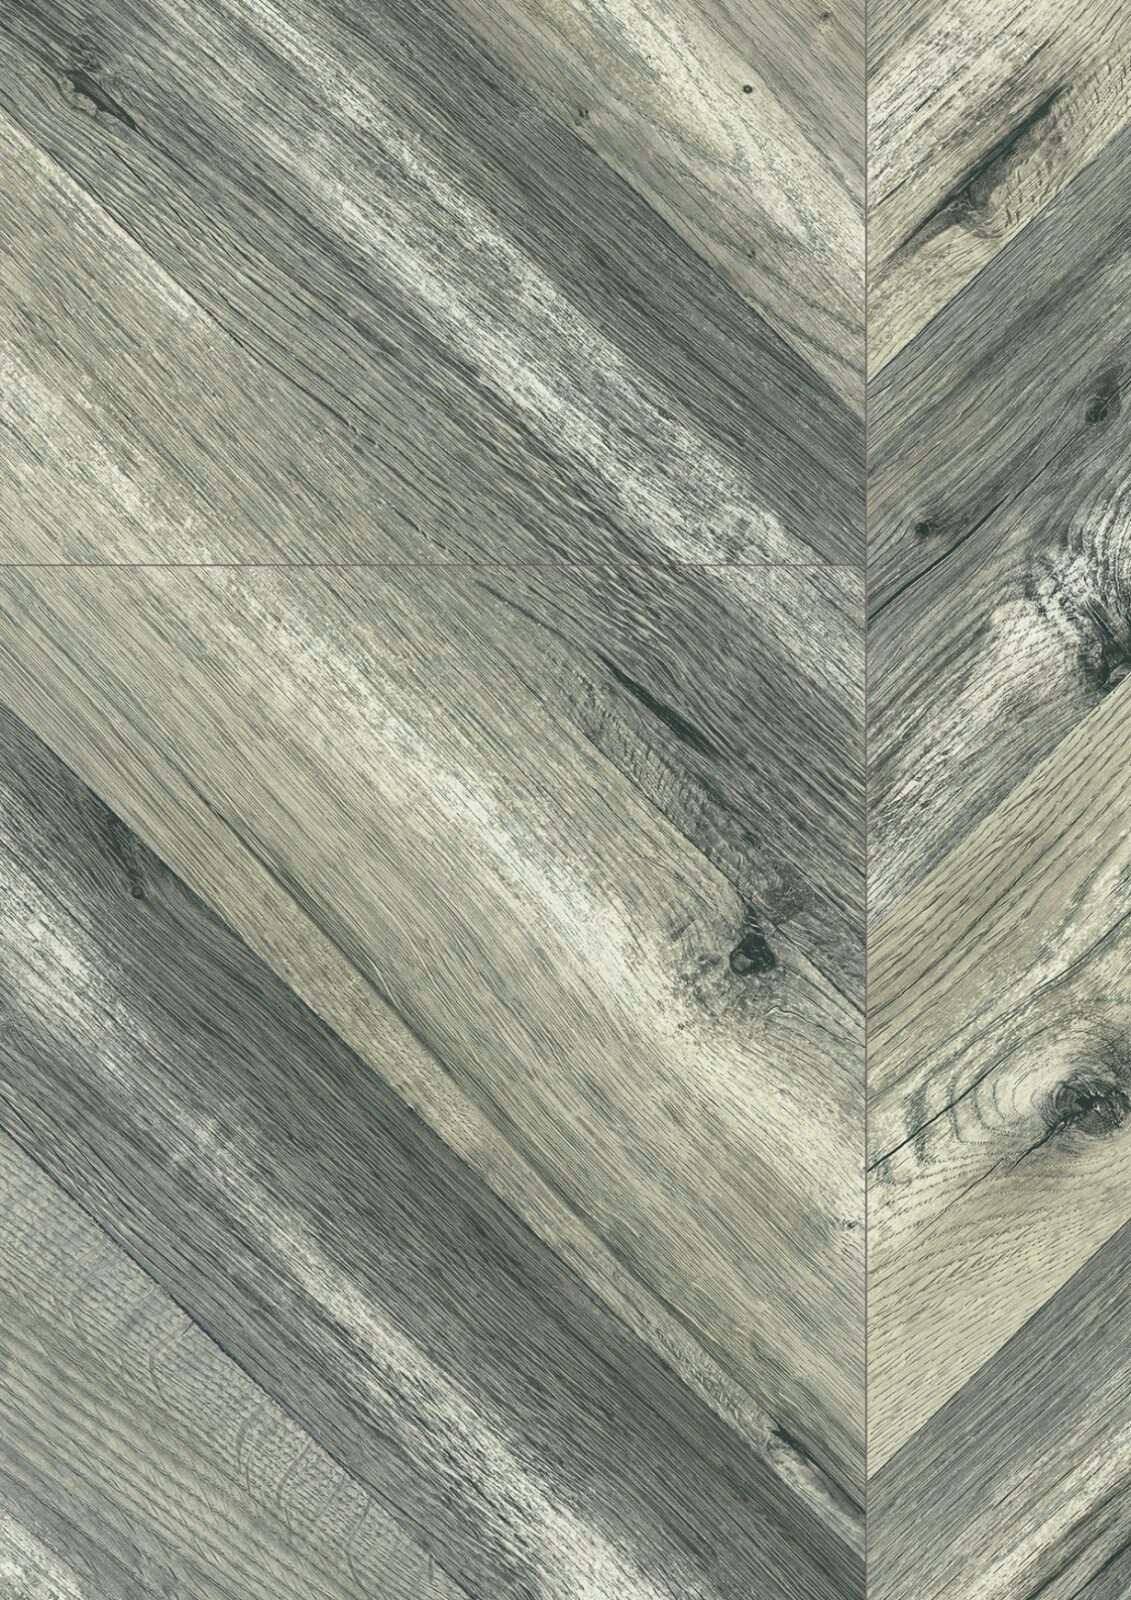 Tarima flotante roble gris espiga a9344 pavimento laminado - Tarima flotante gris ...